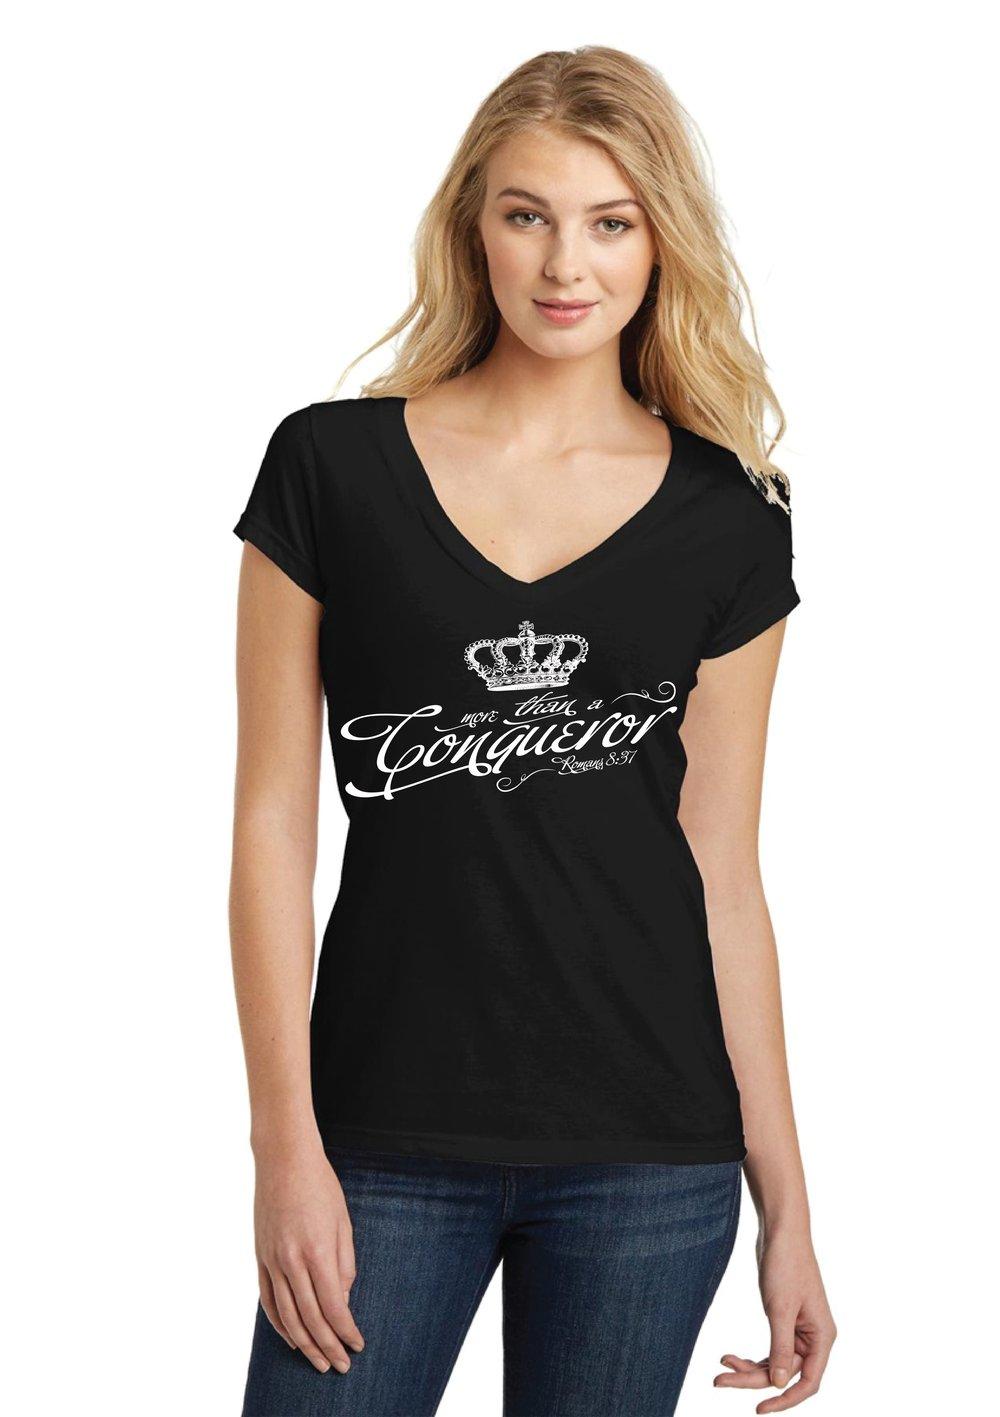 Image of Women's V Neck Conqueror T Shirt